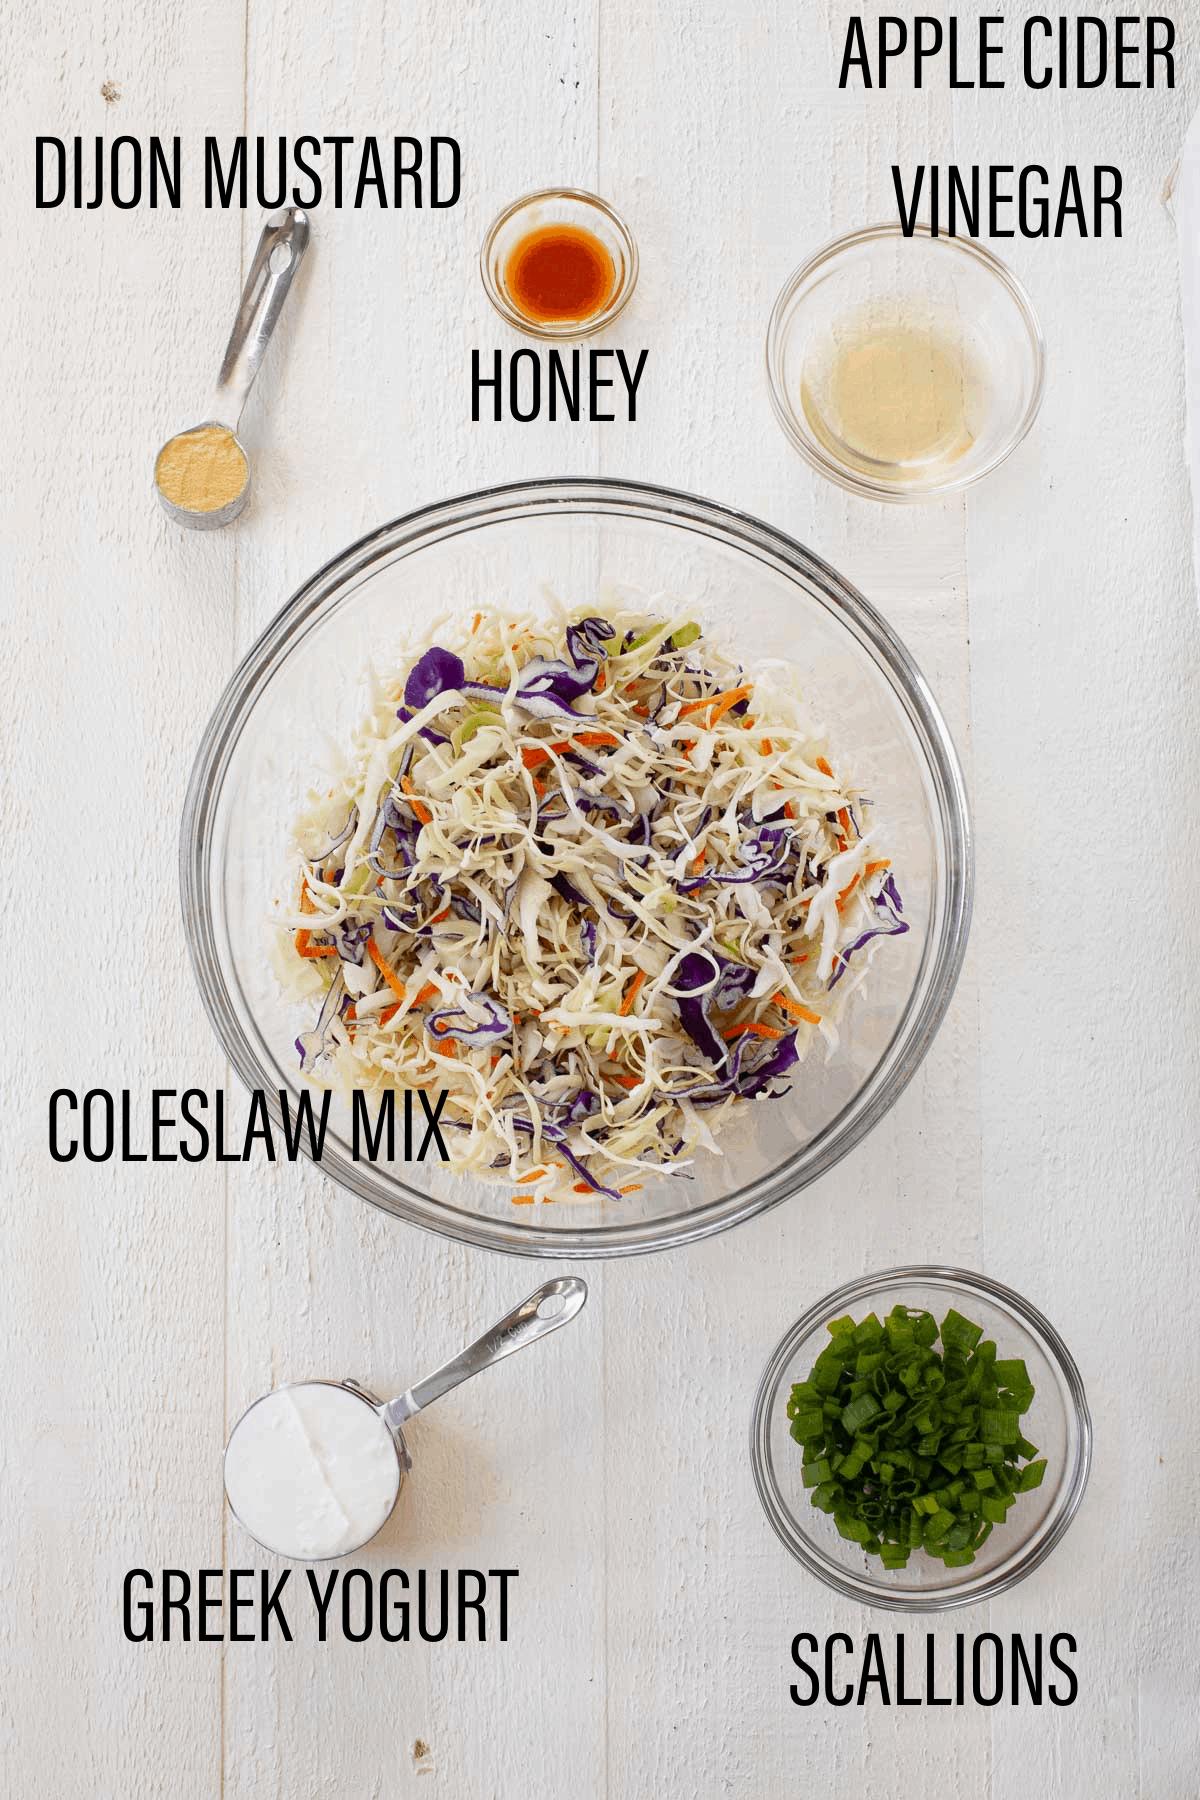 Dijon mustard, honey, apple cider vinegar, coleslaw mix, Greek yogurt, and scallions in separate bowls